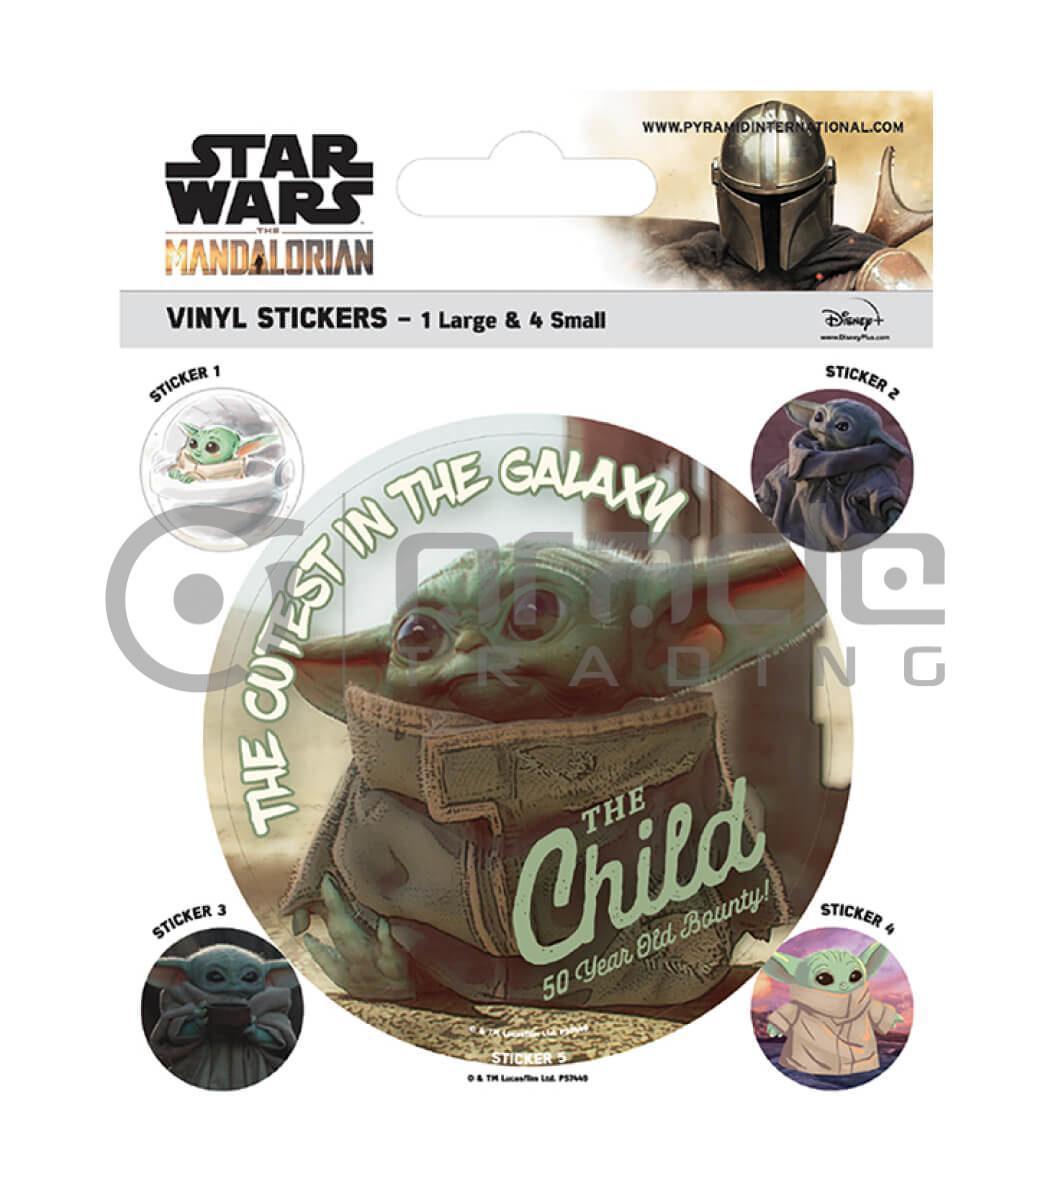 Star Wars: The Mandalorian Vinyl Sticker Pack - The Child